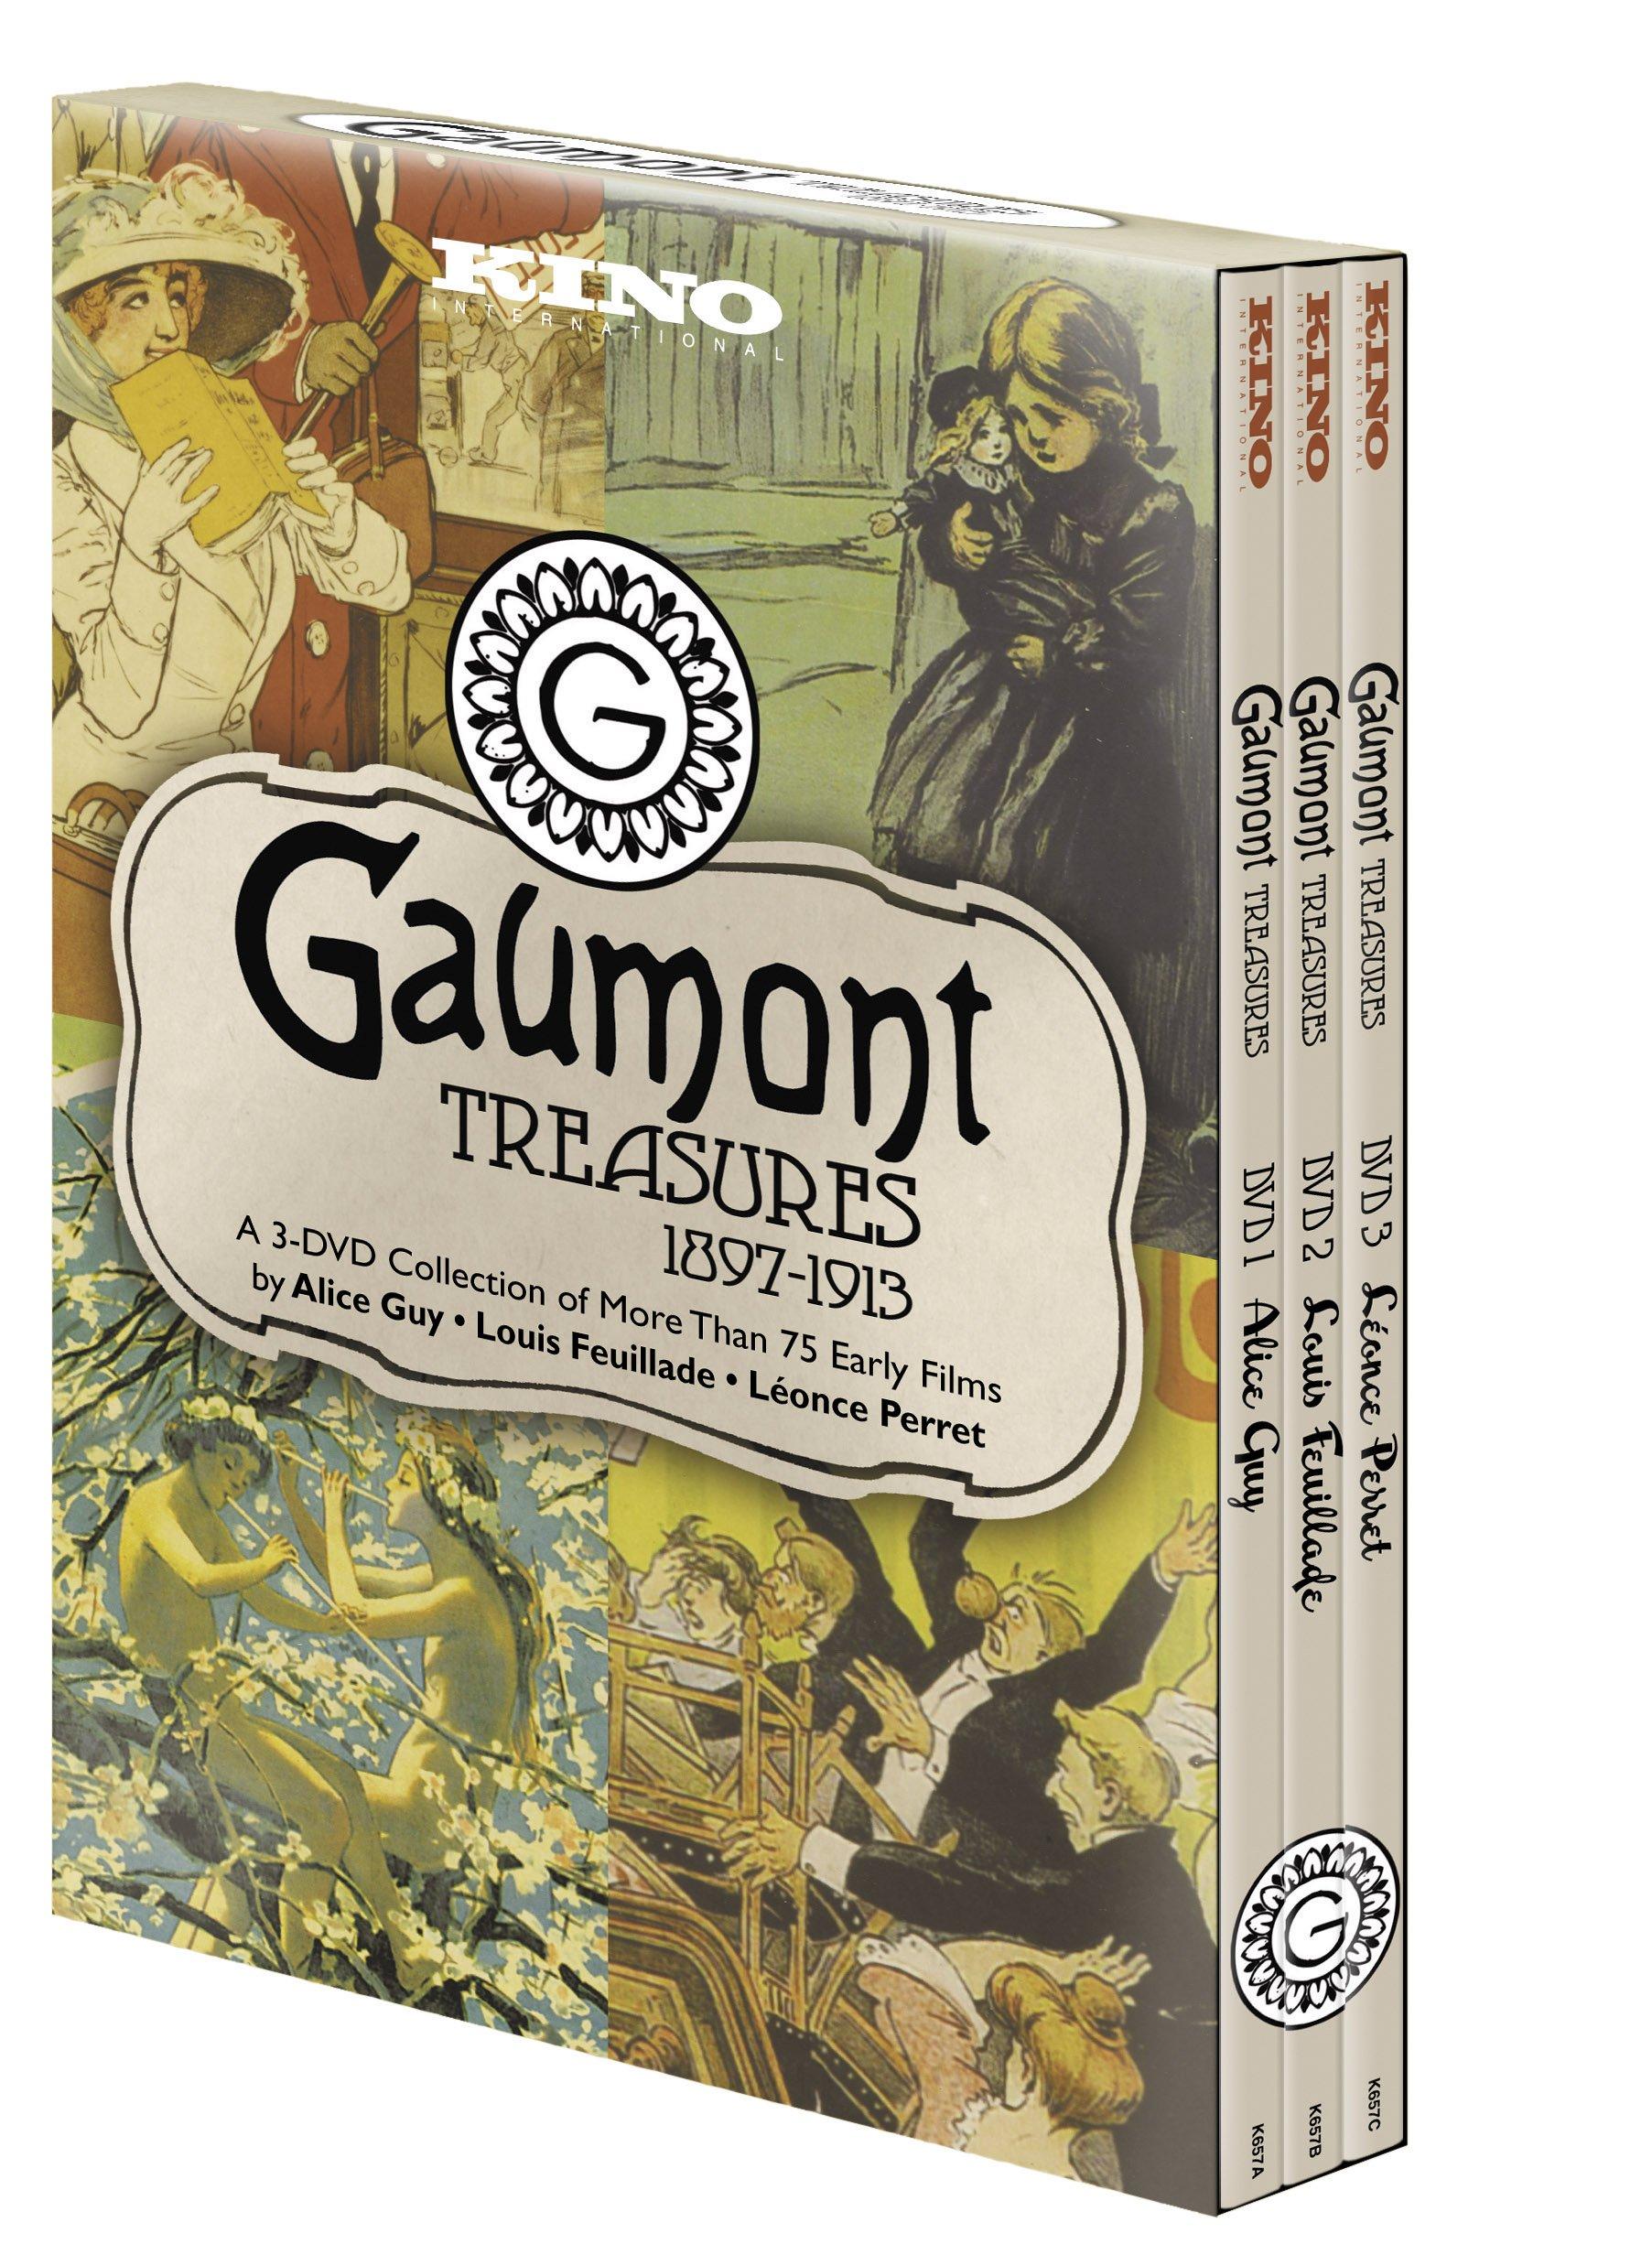 Gaumont Treasures: 1897-1913 by Kino Video